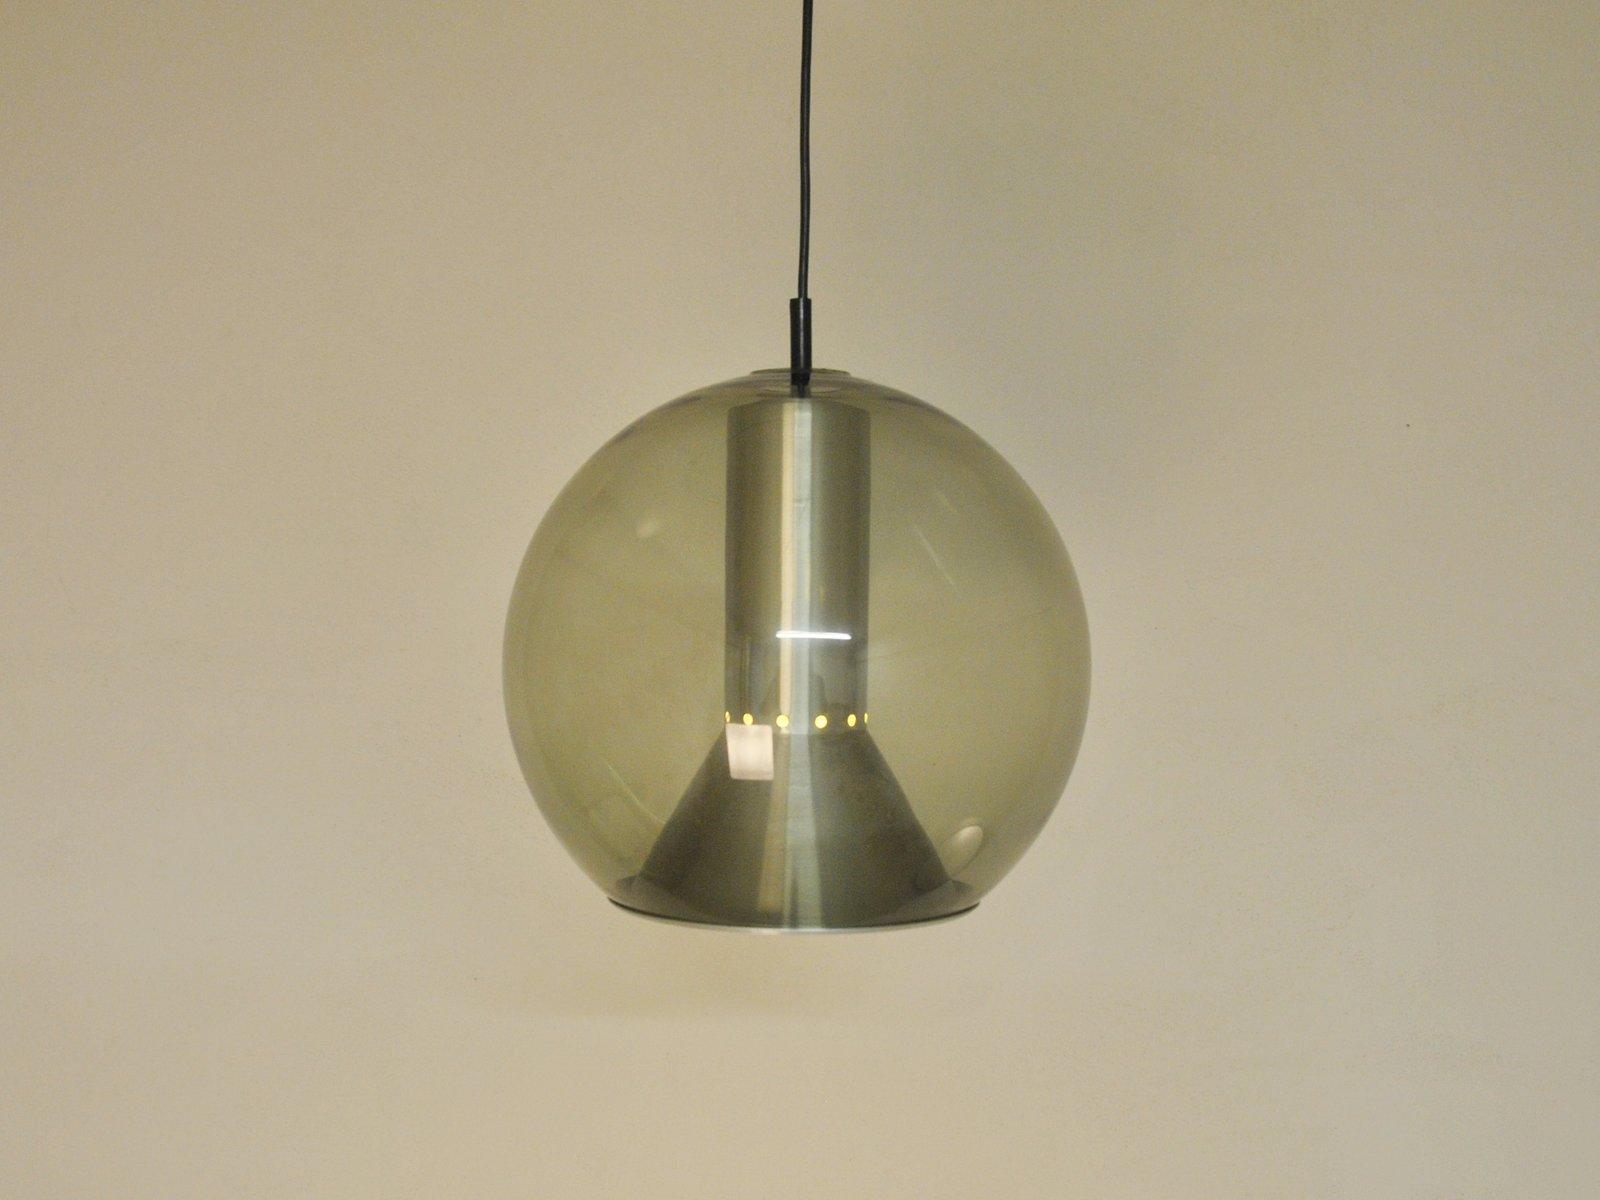 large globe pendant lamp by frank ligtelijn for raak